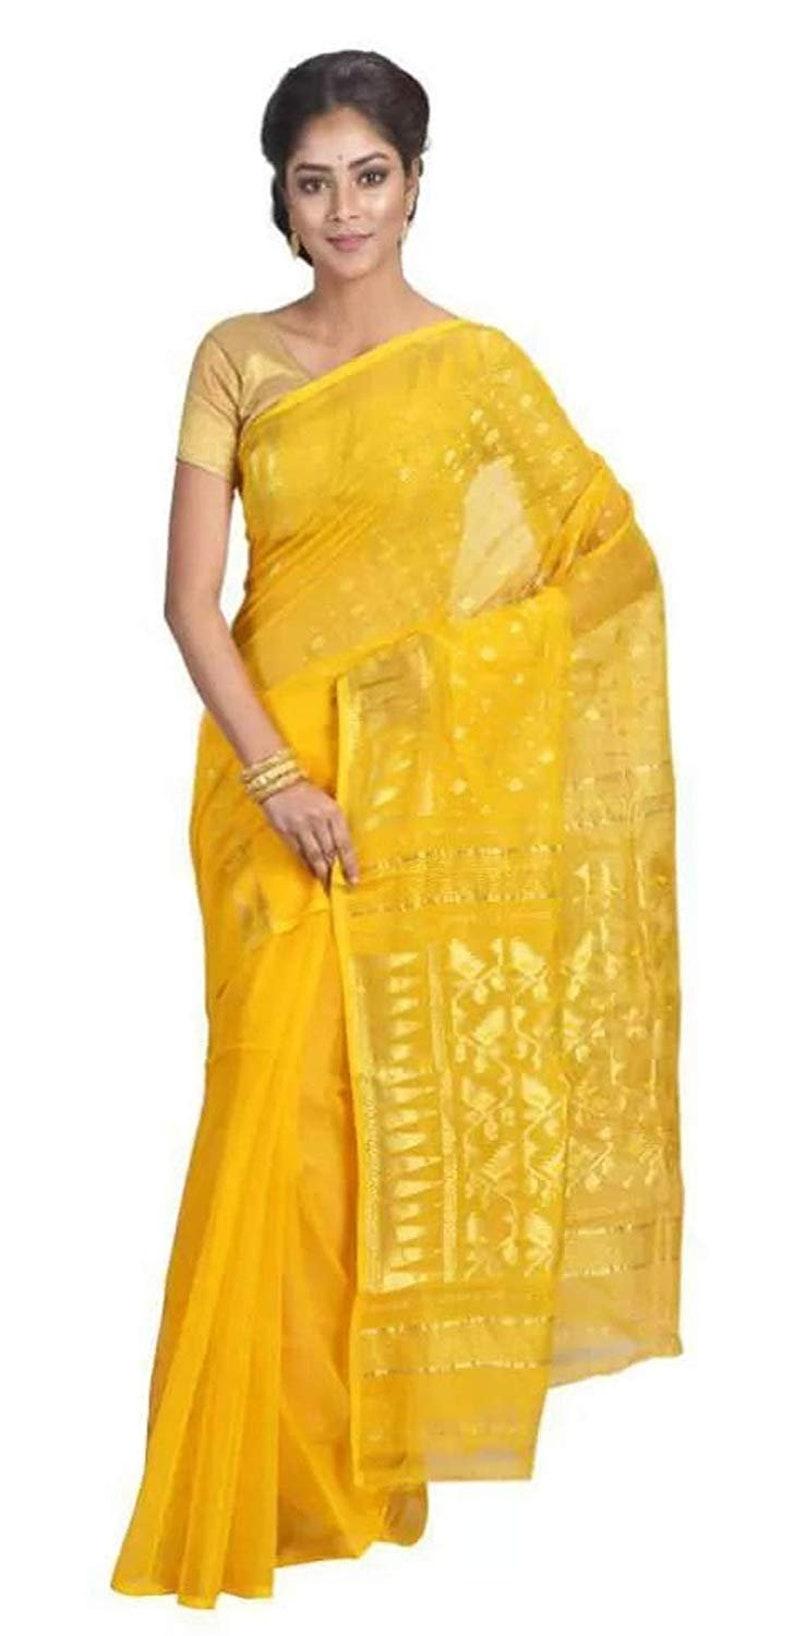 82dc709c1a9 Silk Muslin Jamdani Dhakai(Soft) - Original Bengal Handloom Saree  (Handcrafted)-Yellow